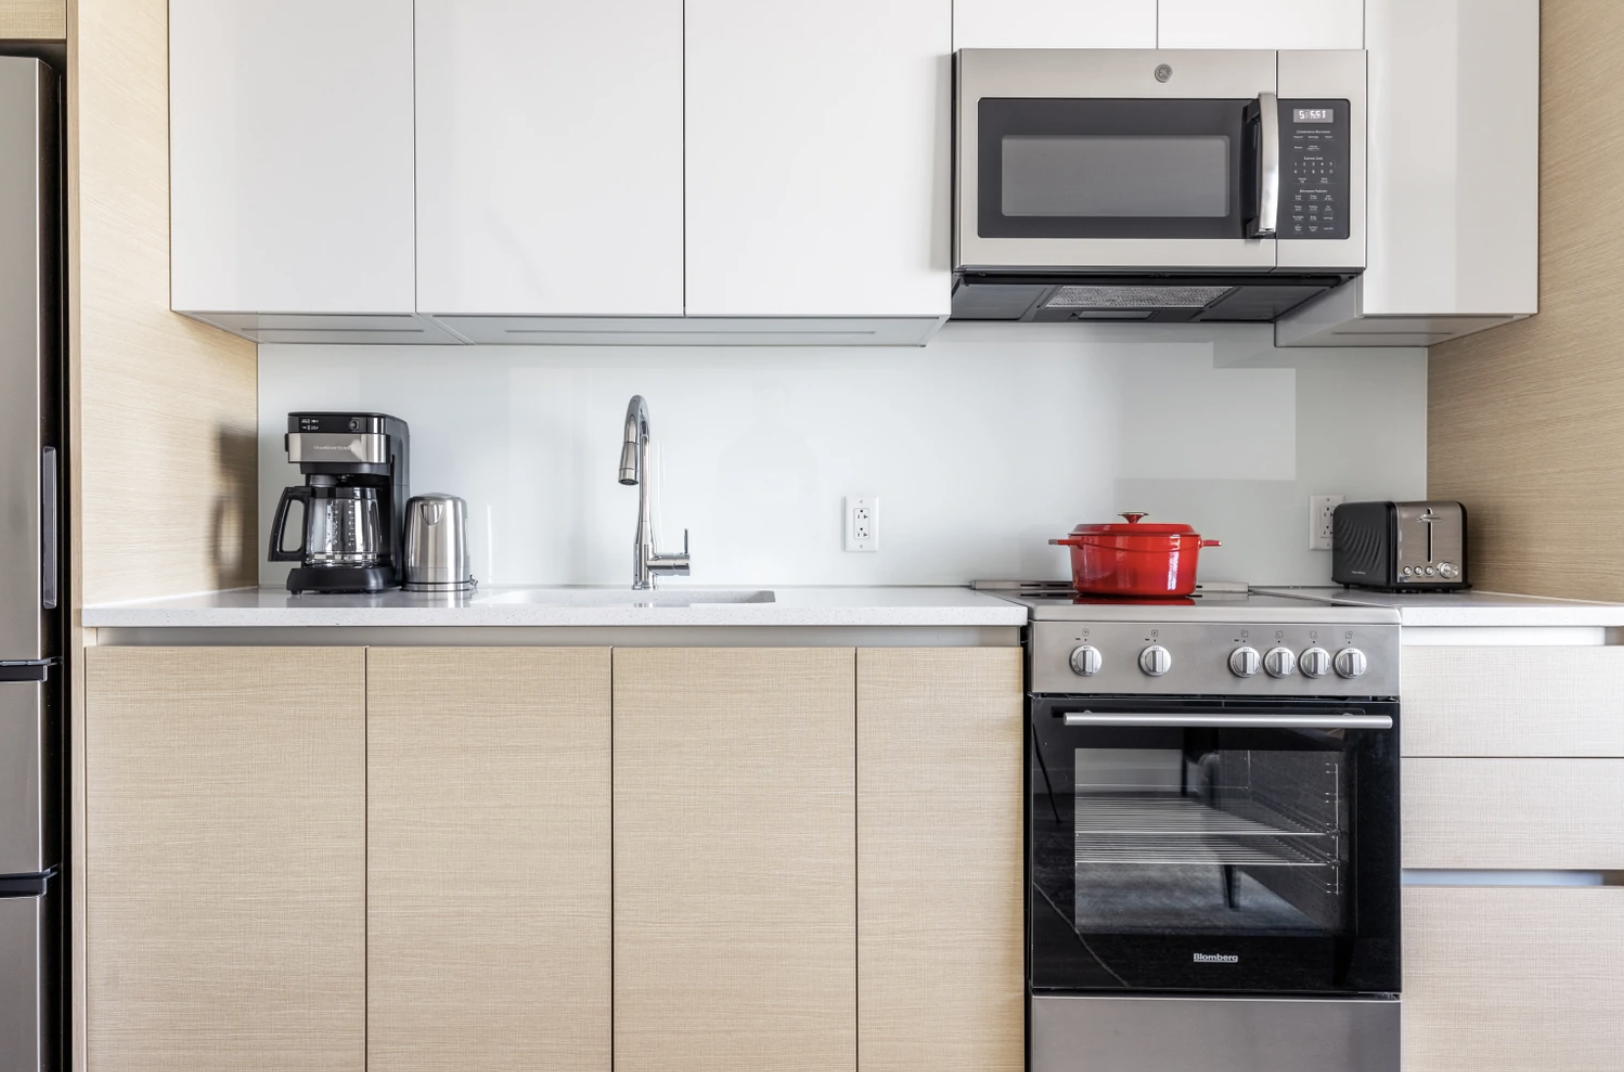 Kitchen at Hub50House Apartments, Centre, Boston